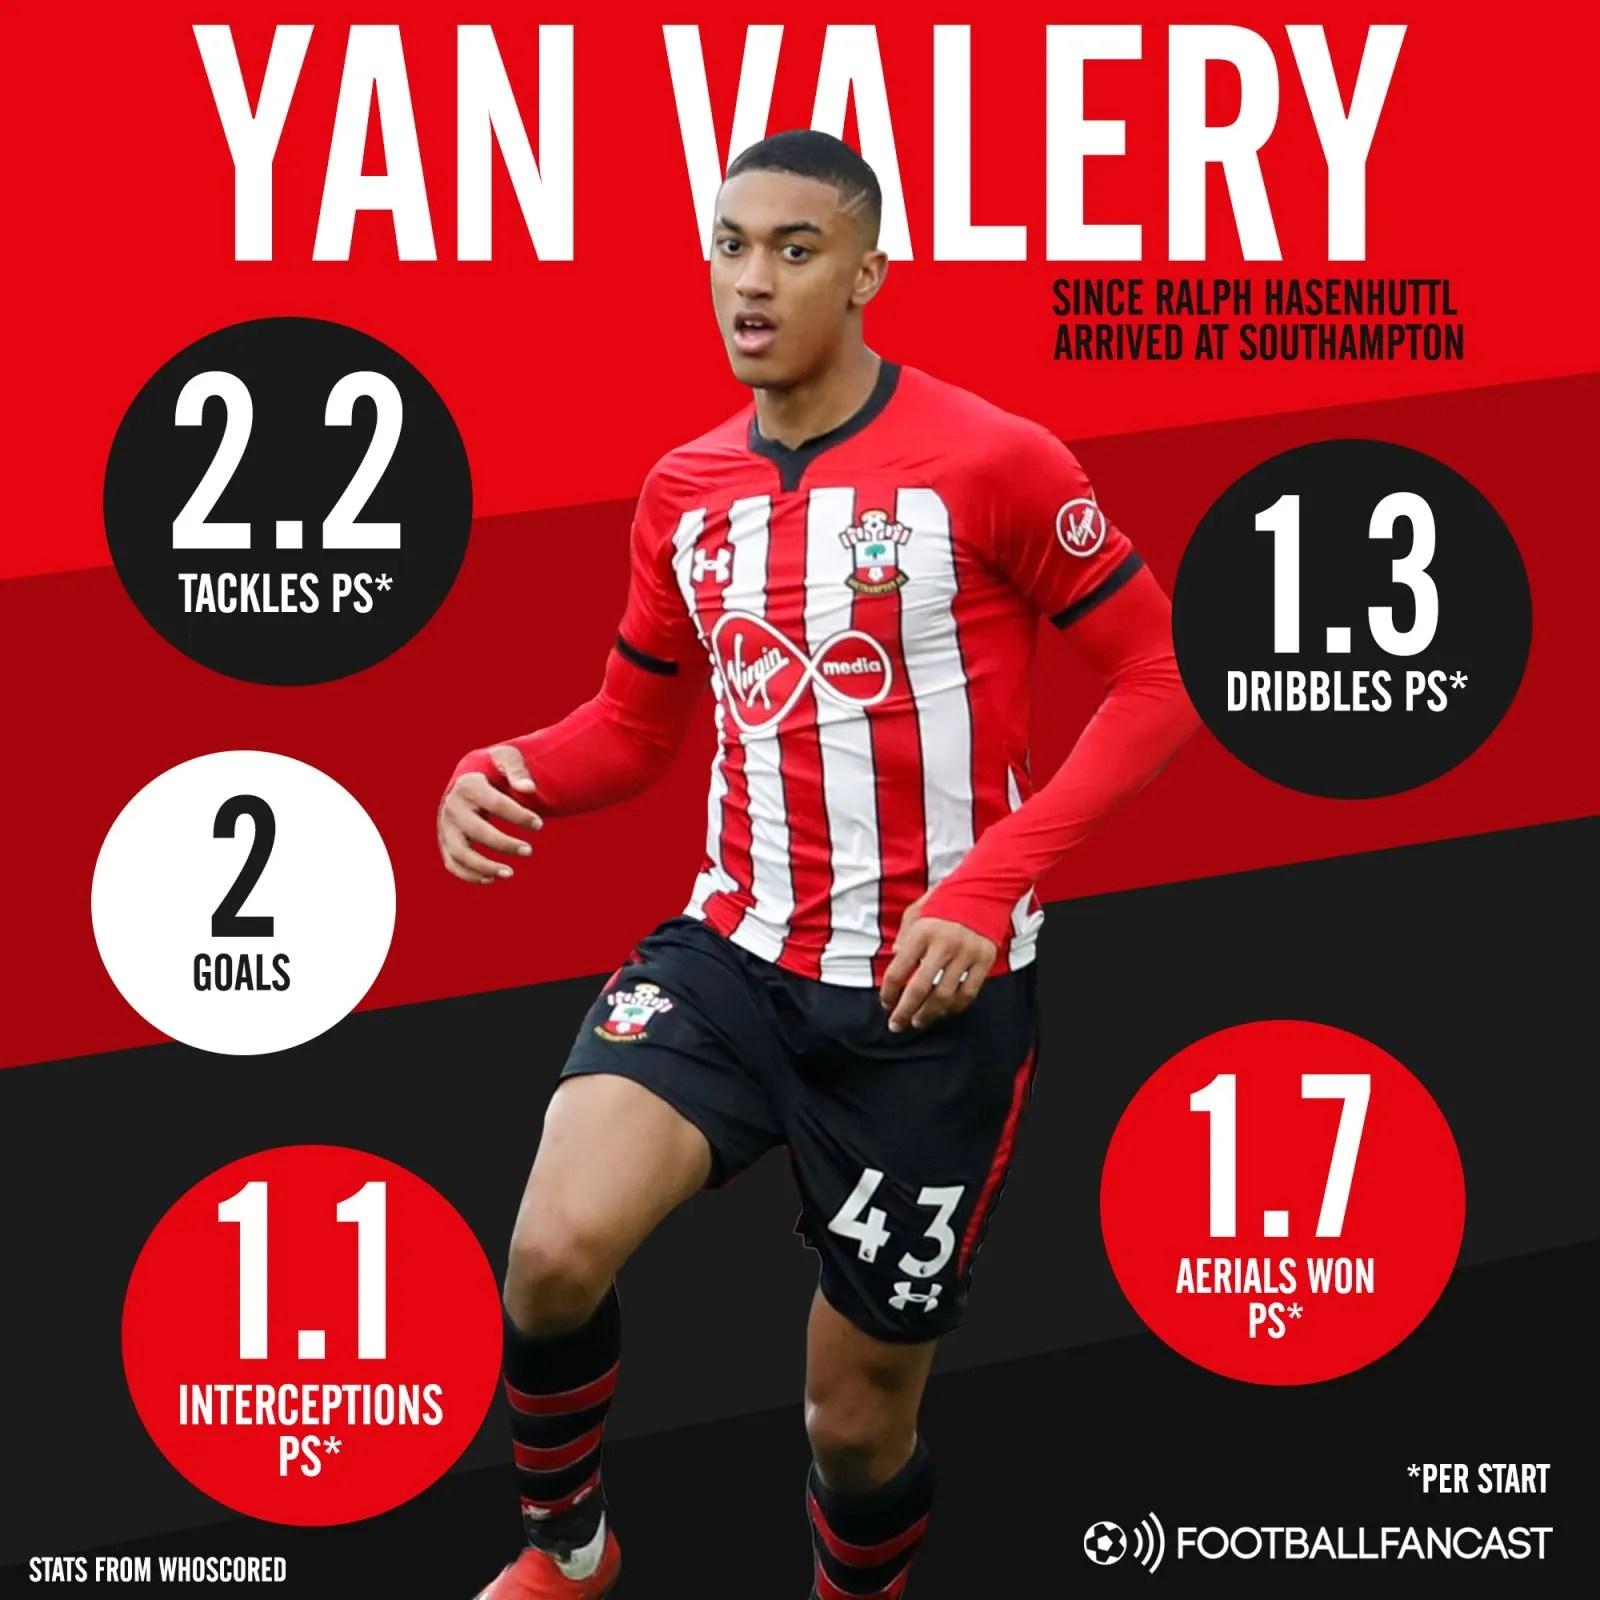 Yan-Valery